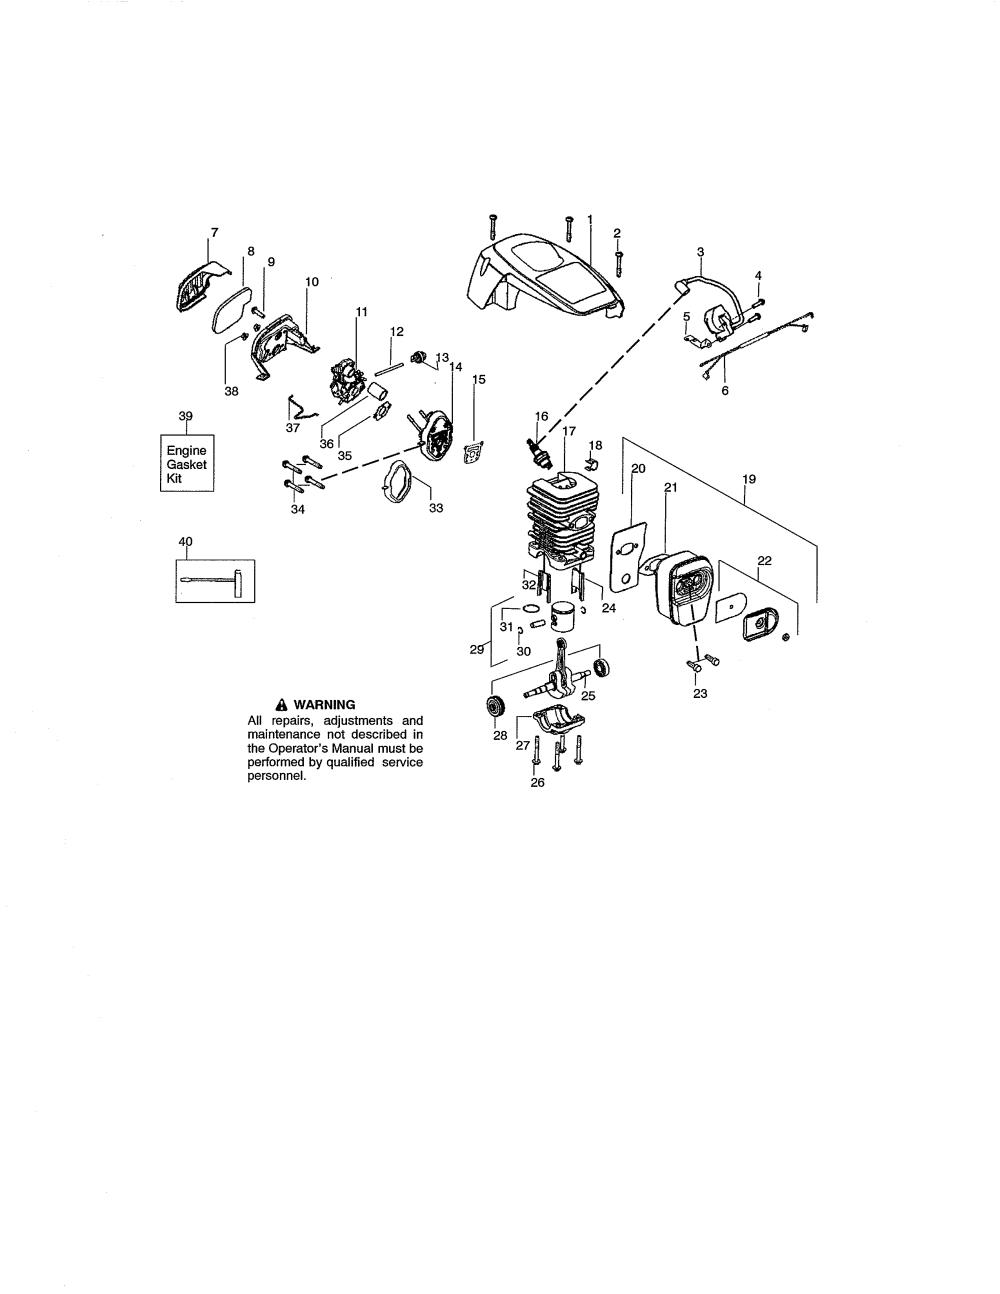 medium resolution of craftsman 42cc chainsaw carburetor engine diagram